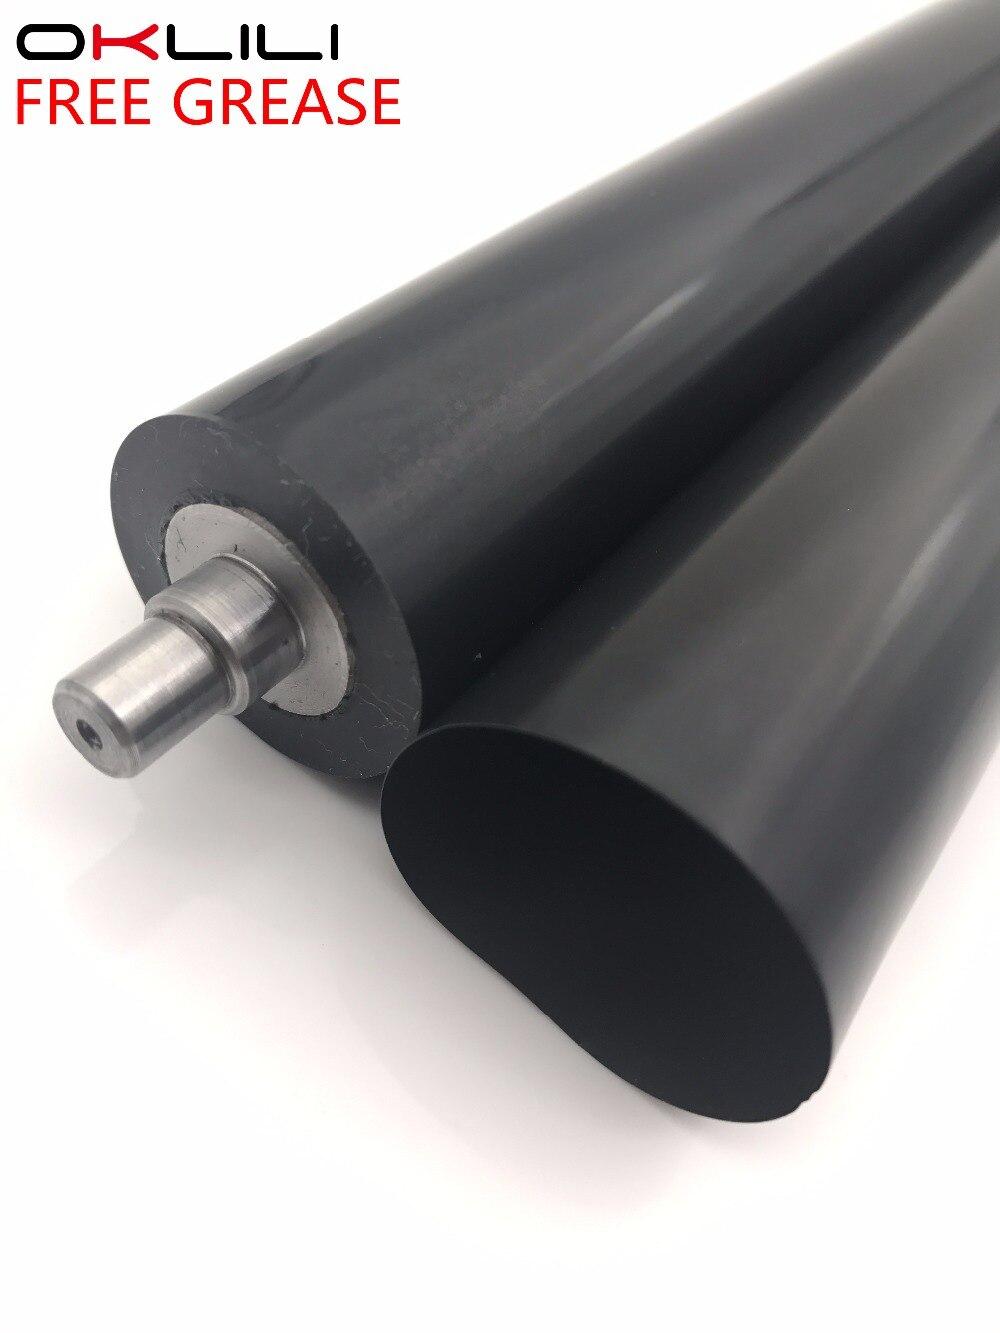 3PCS Fuser Film Sleeve Brother DCP L5500 L5600 L5650 HL L5000 L5100 L5200 L6200